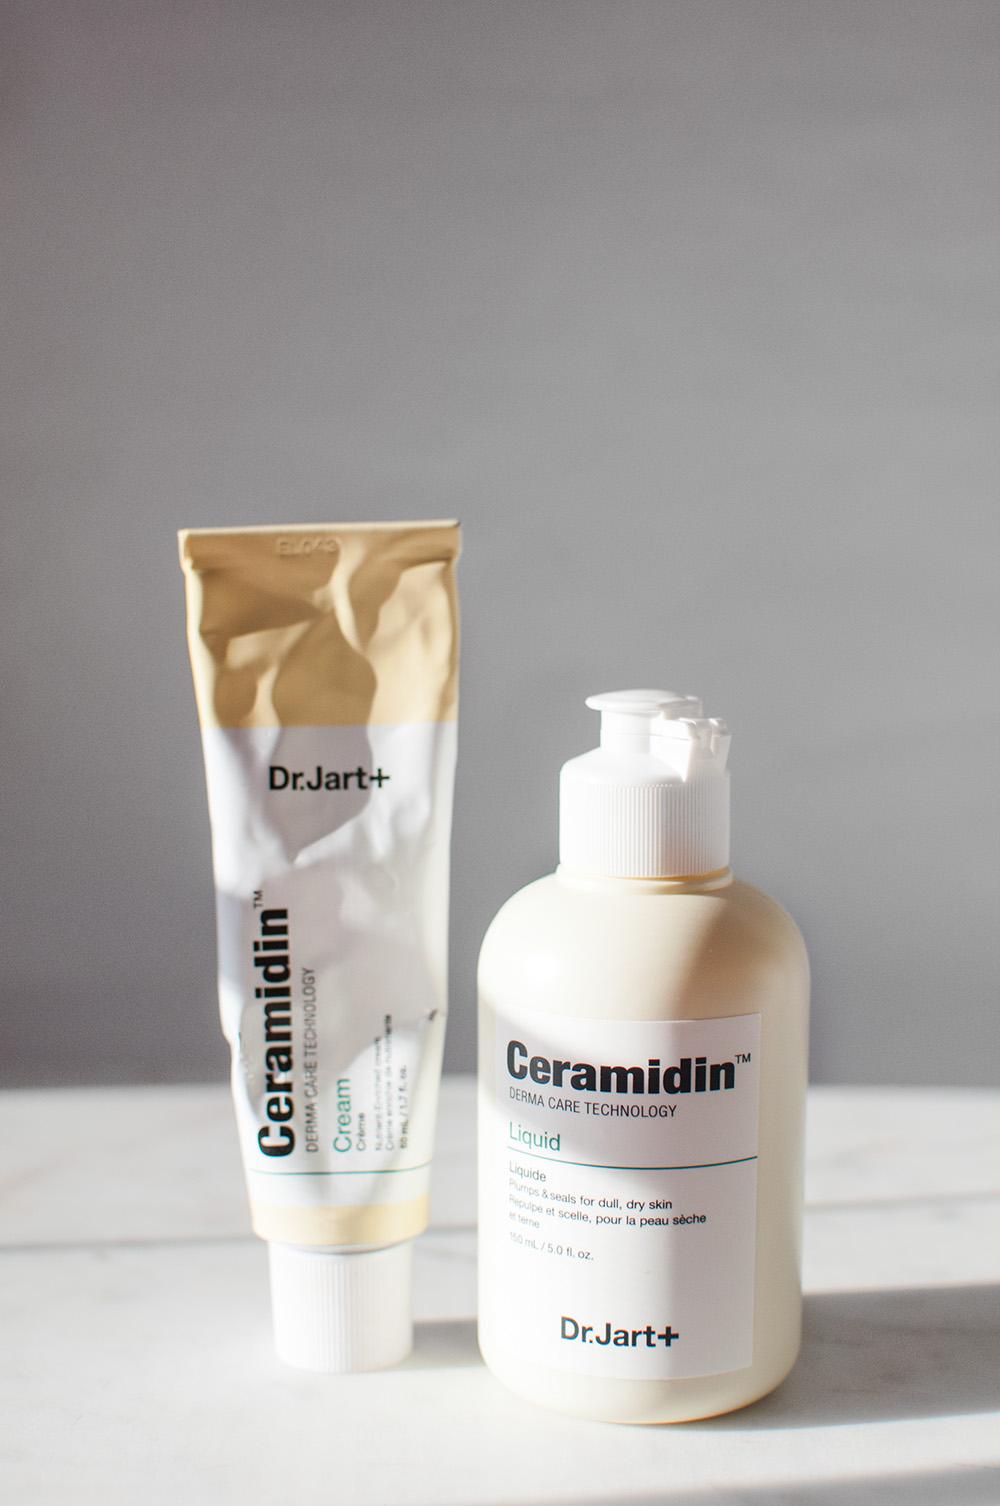 dr jart sephora, dr jart ceramidin cream, dr jart ceramidin liquid, dr jart haul, dr jart ceramidin review, dr jart ceramidin haul